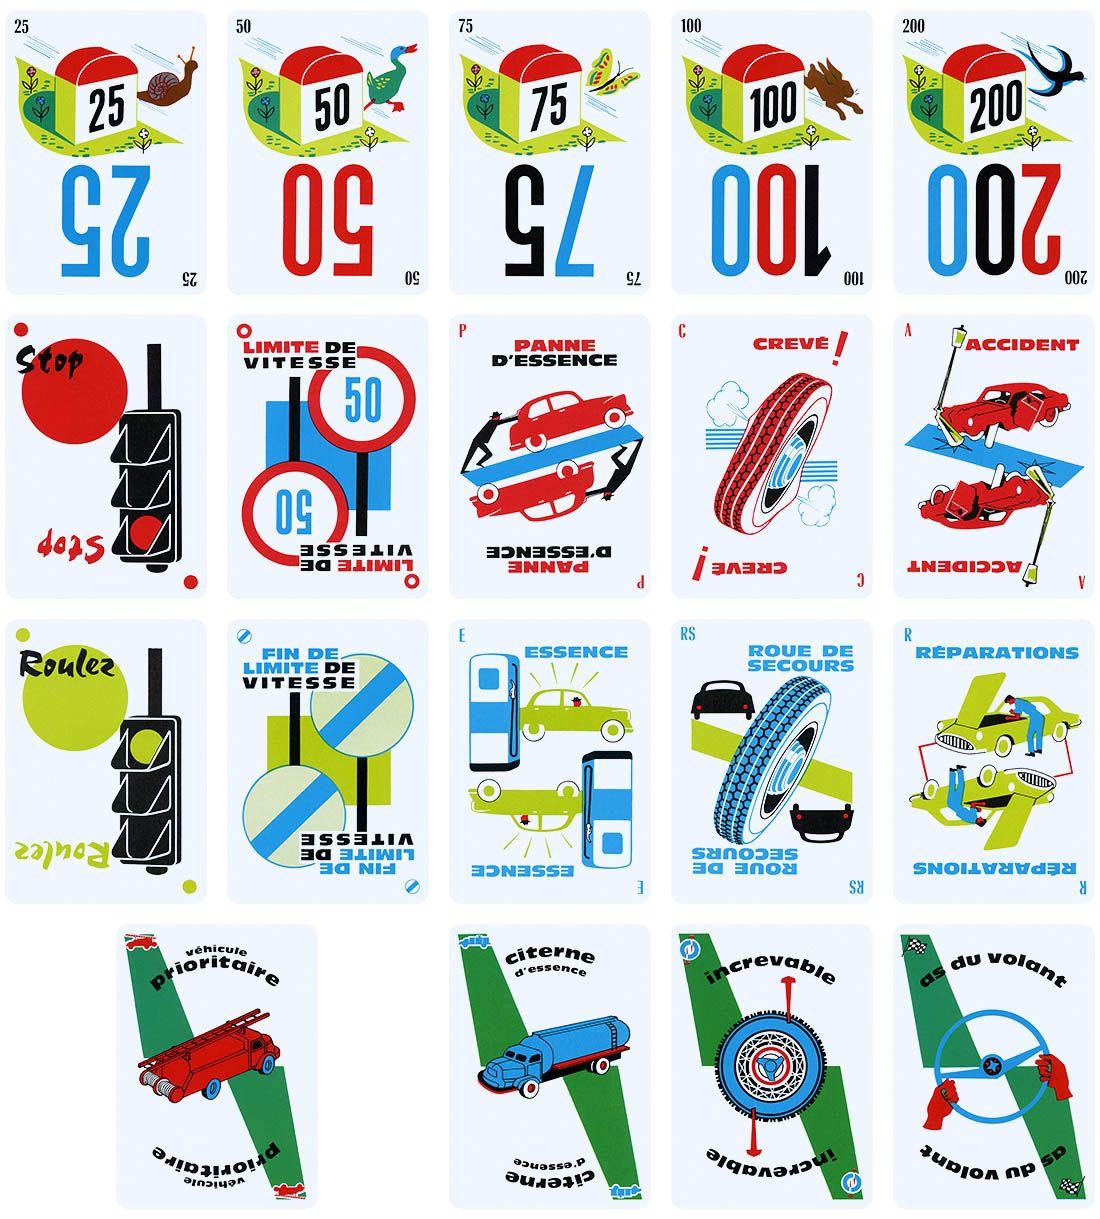 cards fr 1960 lg inspiration graphique inspiring graphic design pinterest souvenirs. Black Bedroom Furniture Sets. Home Design Ideas